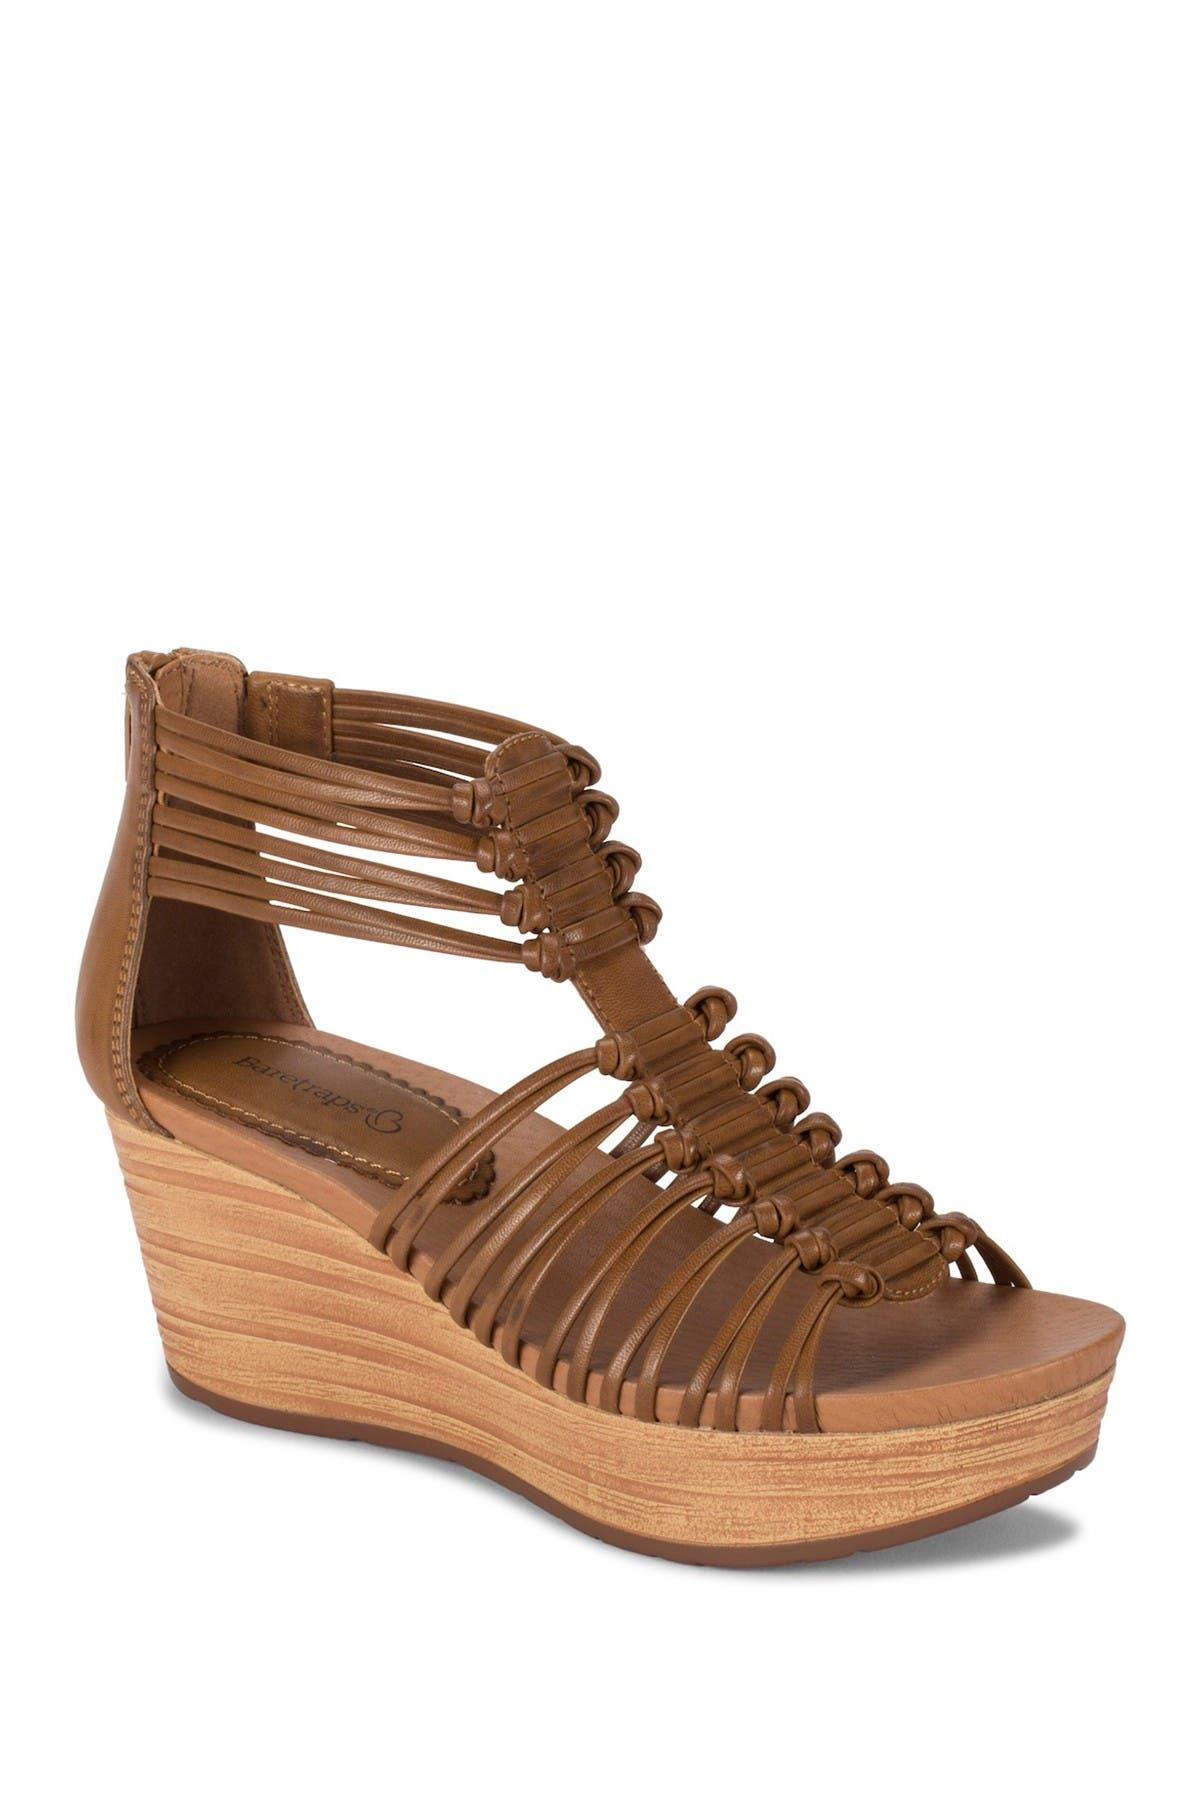 Image of BareTraps Maelei Wedge Sandal